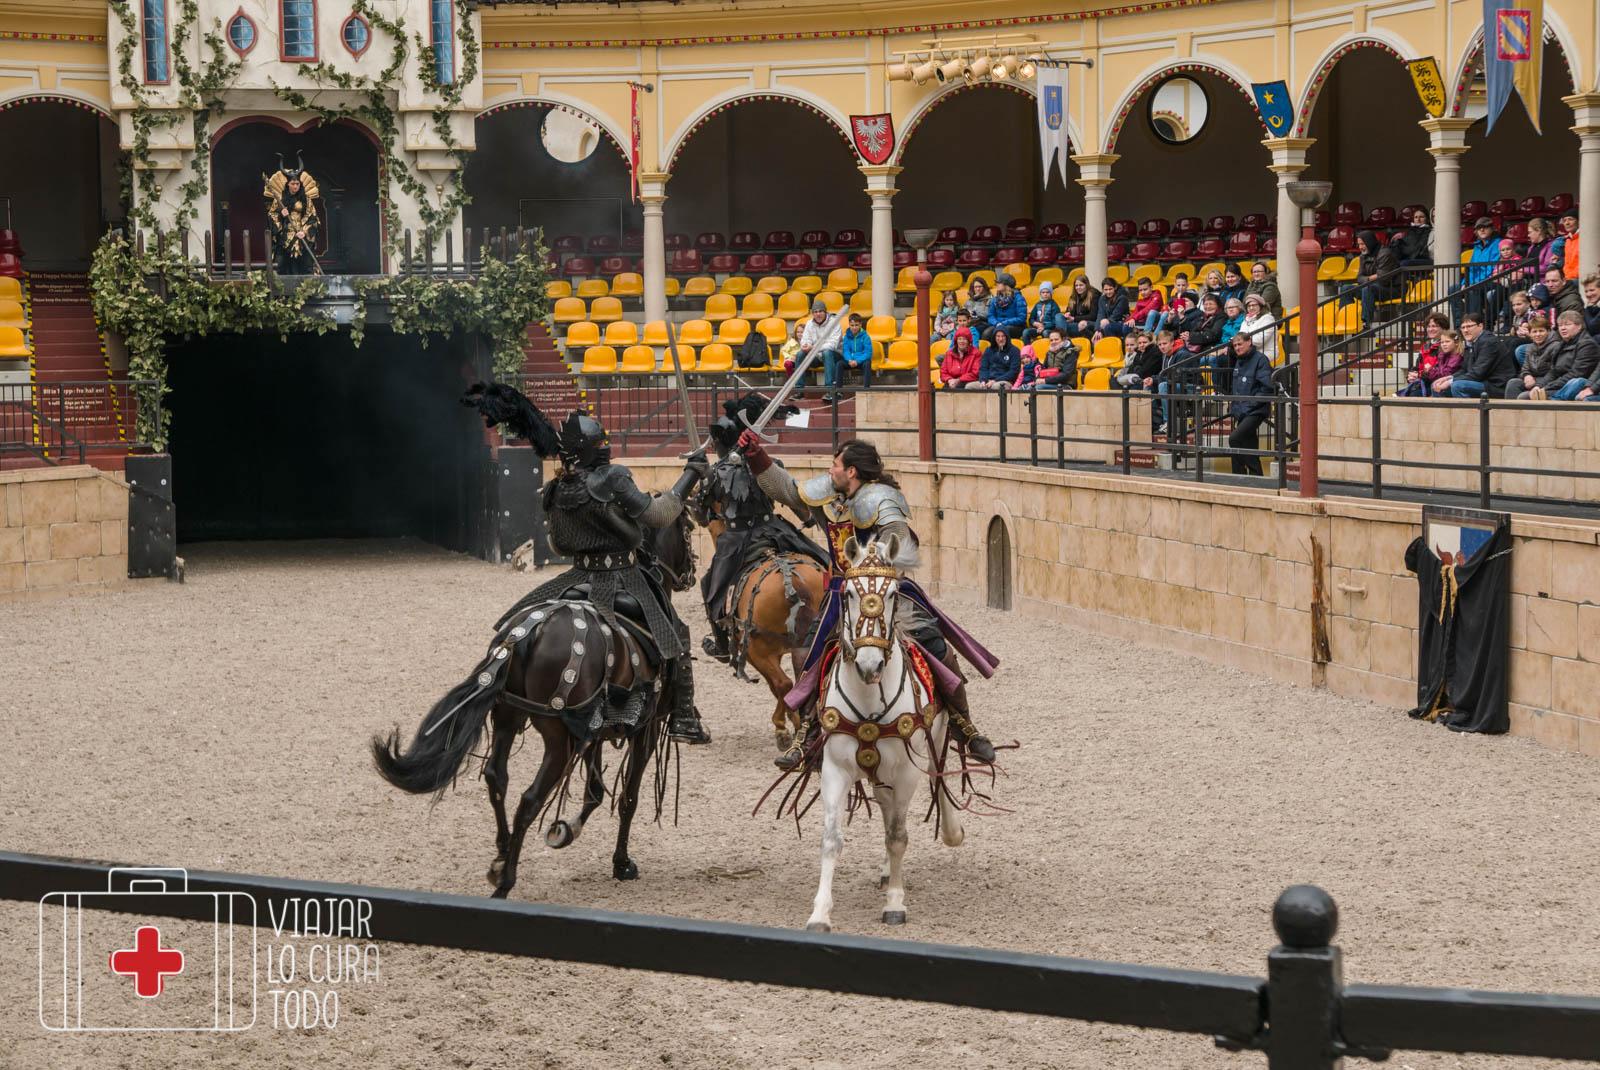 Europa Park Shows